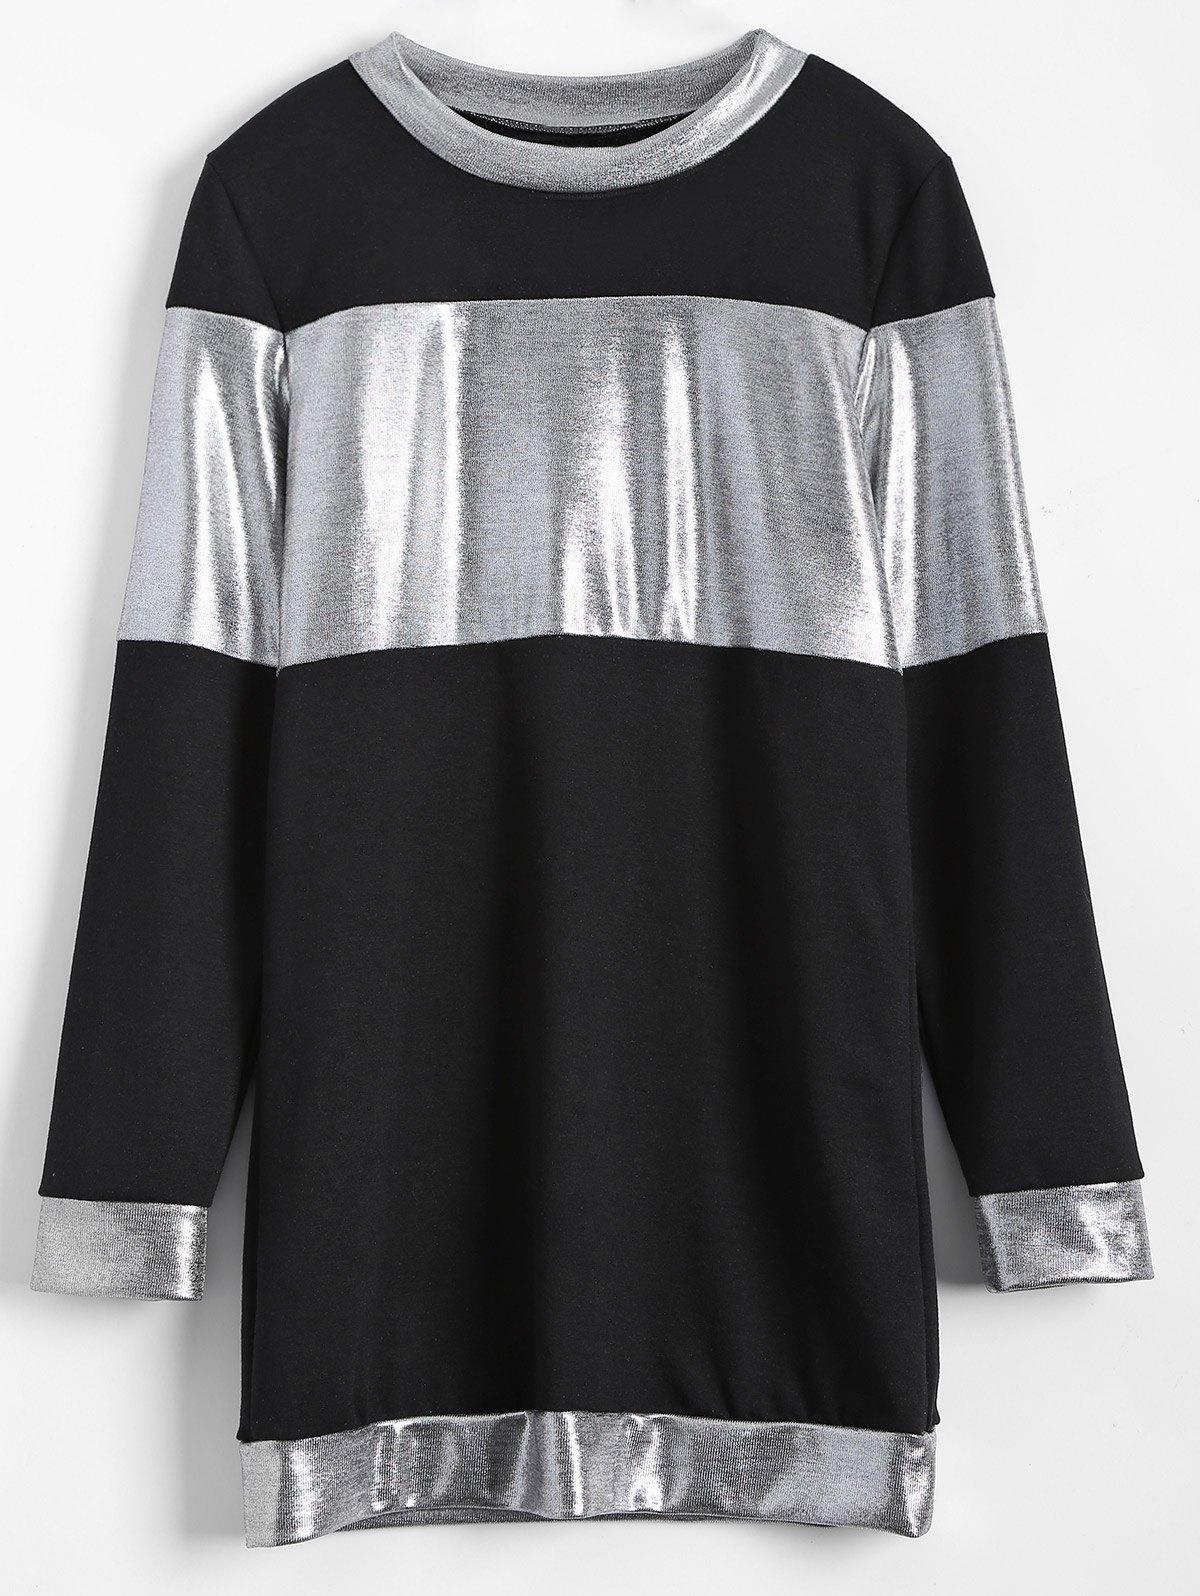 Metallic Color Mini Dress